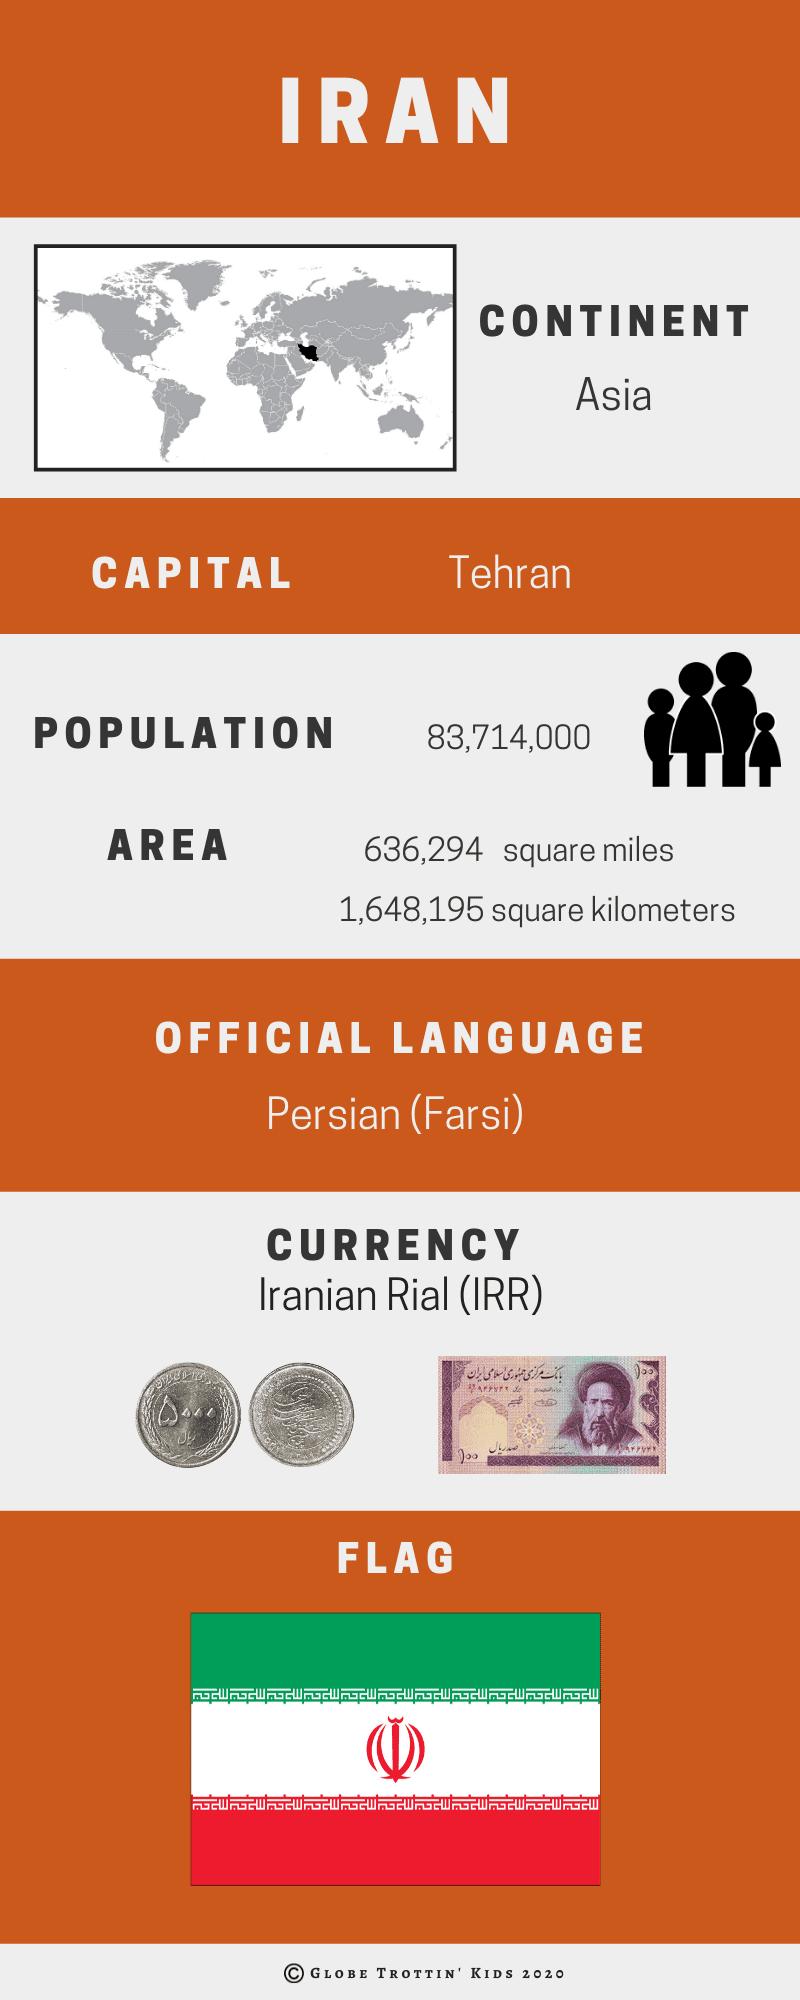 Iran Infographic